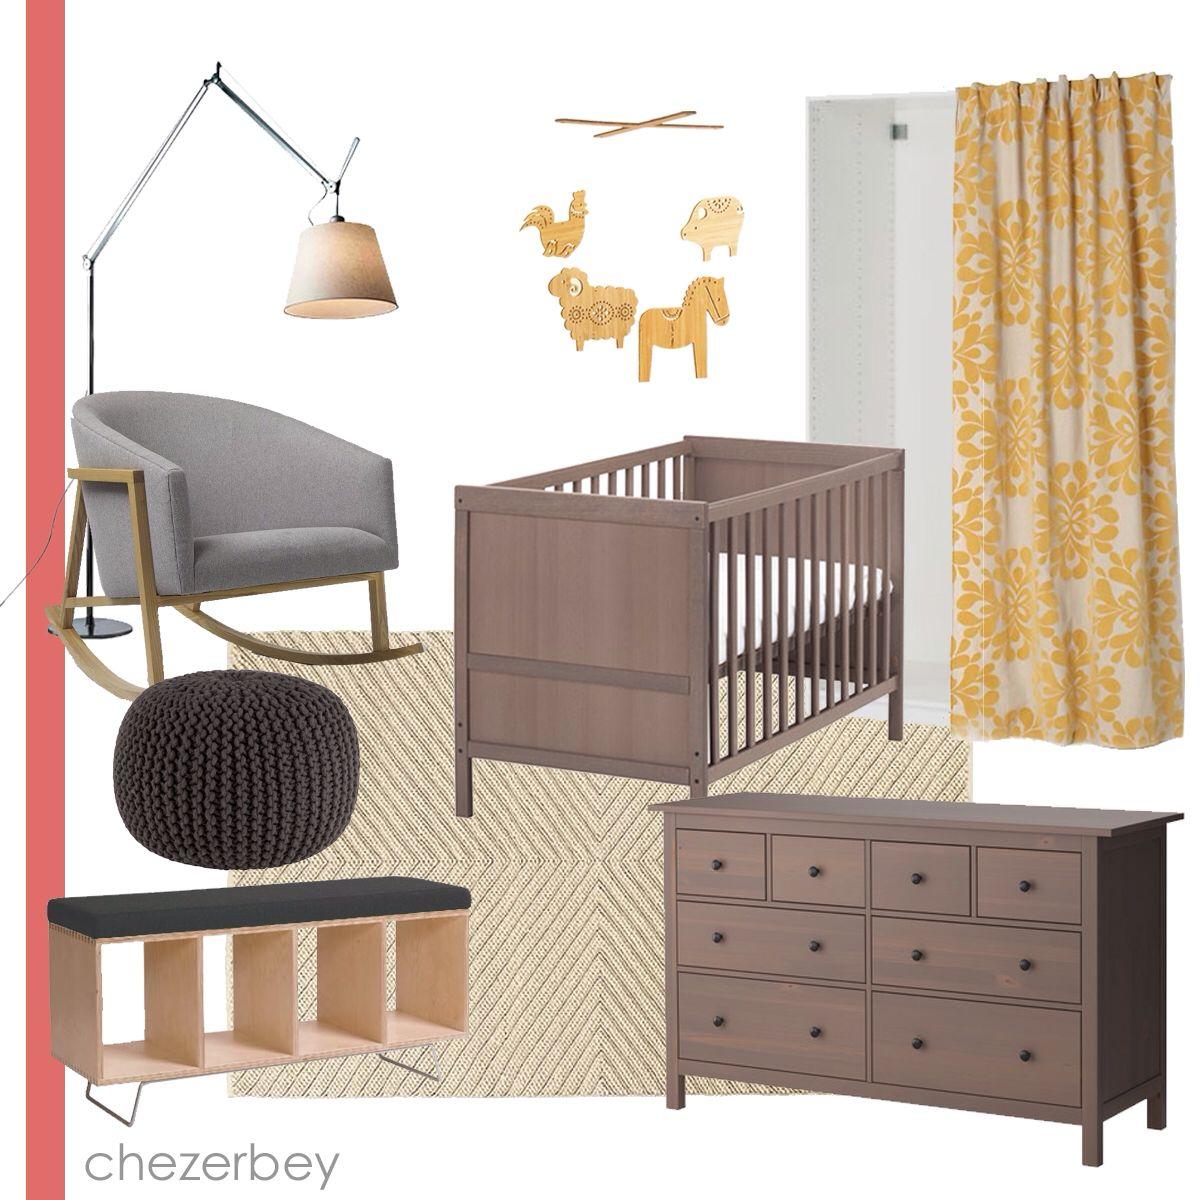 Nursery in 2019 Ikea kinderzimmer ideen, Baby